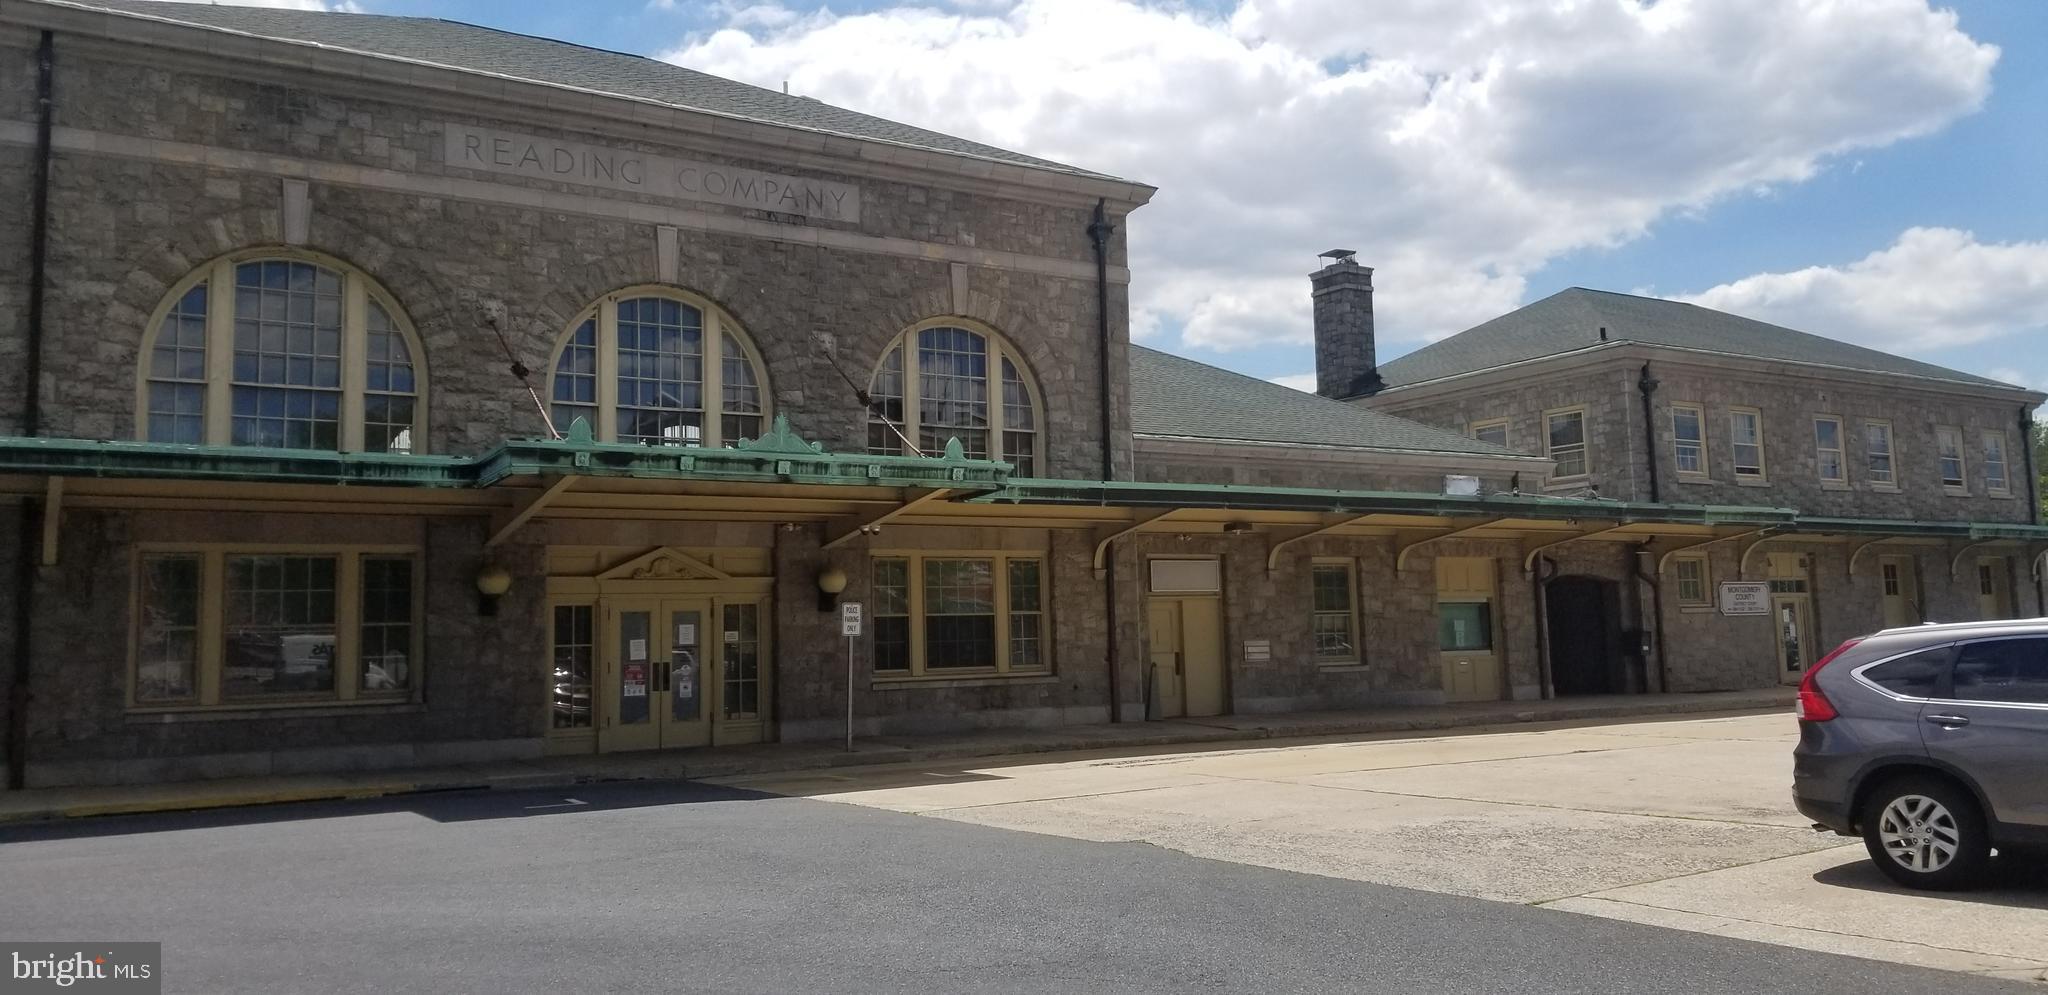 1 Security Plaza, Pottstown, PA 19464